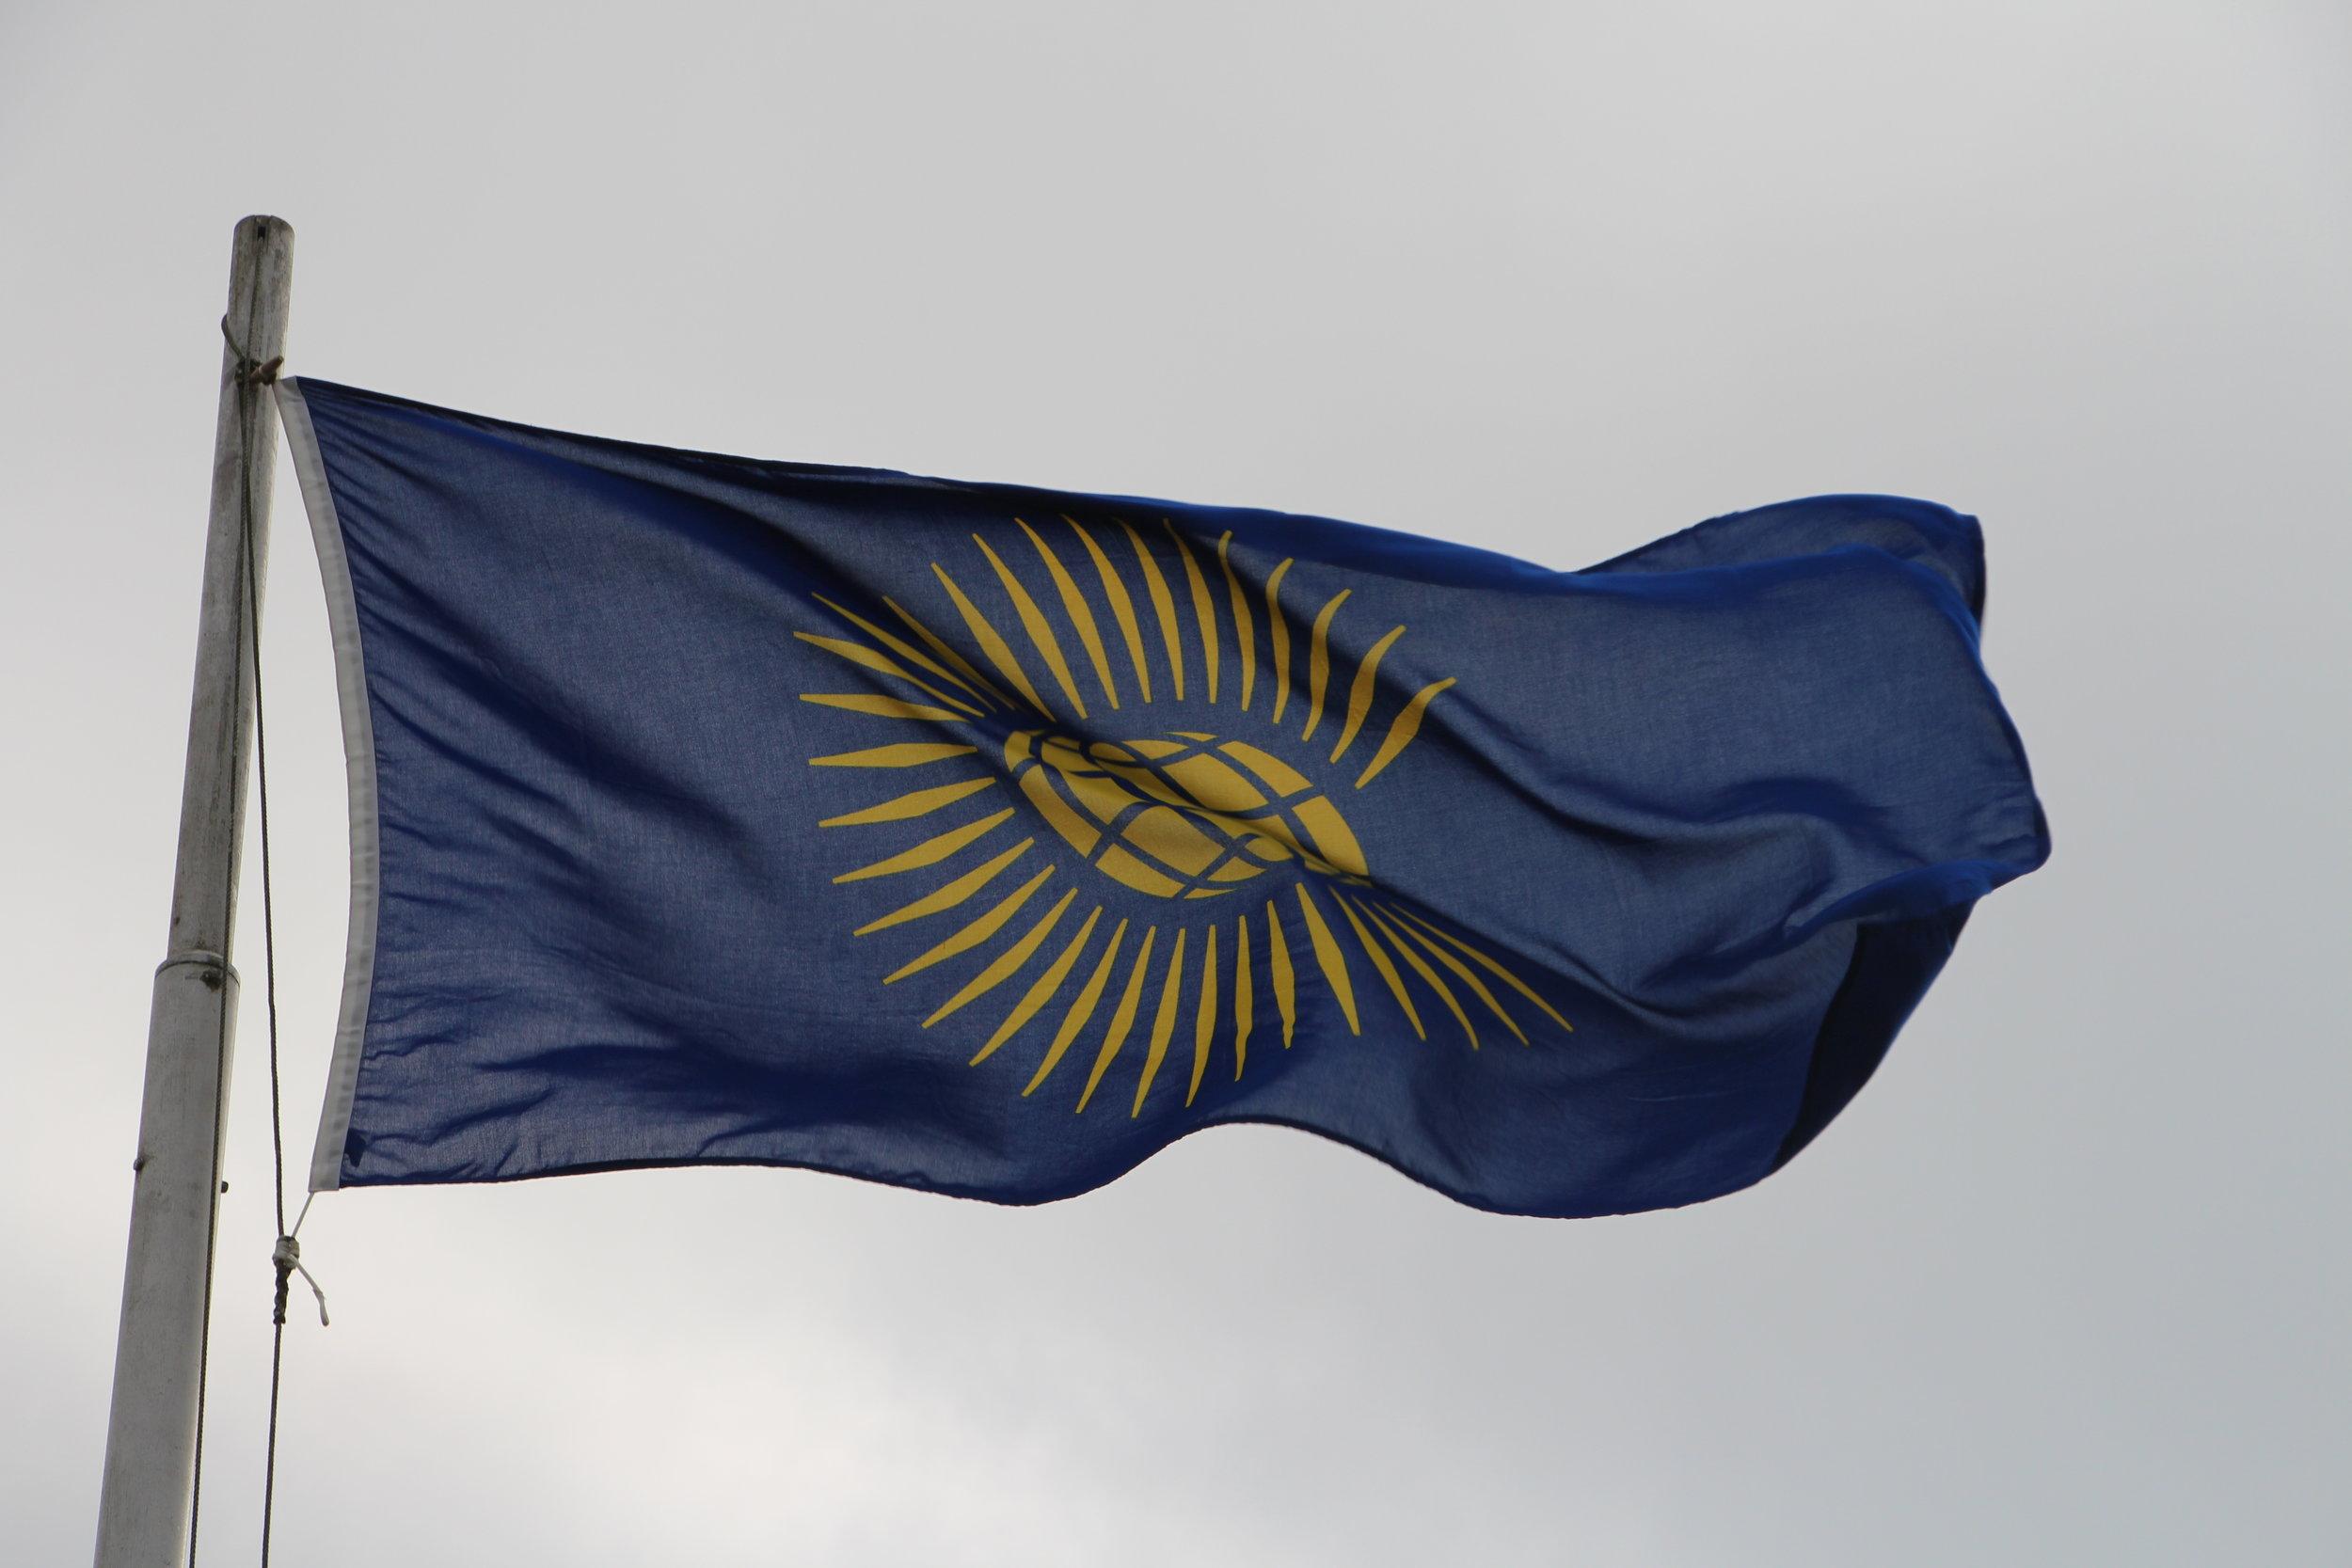 COMMONWEALTH FLAG RAISING 2016